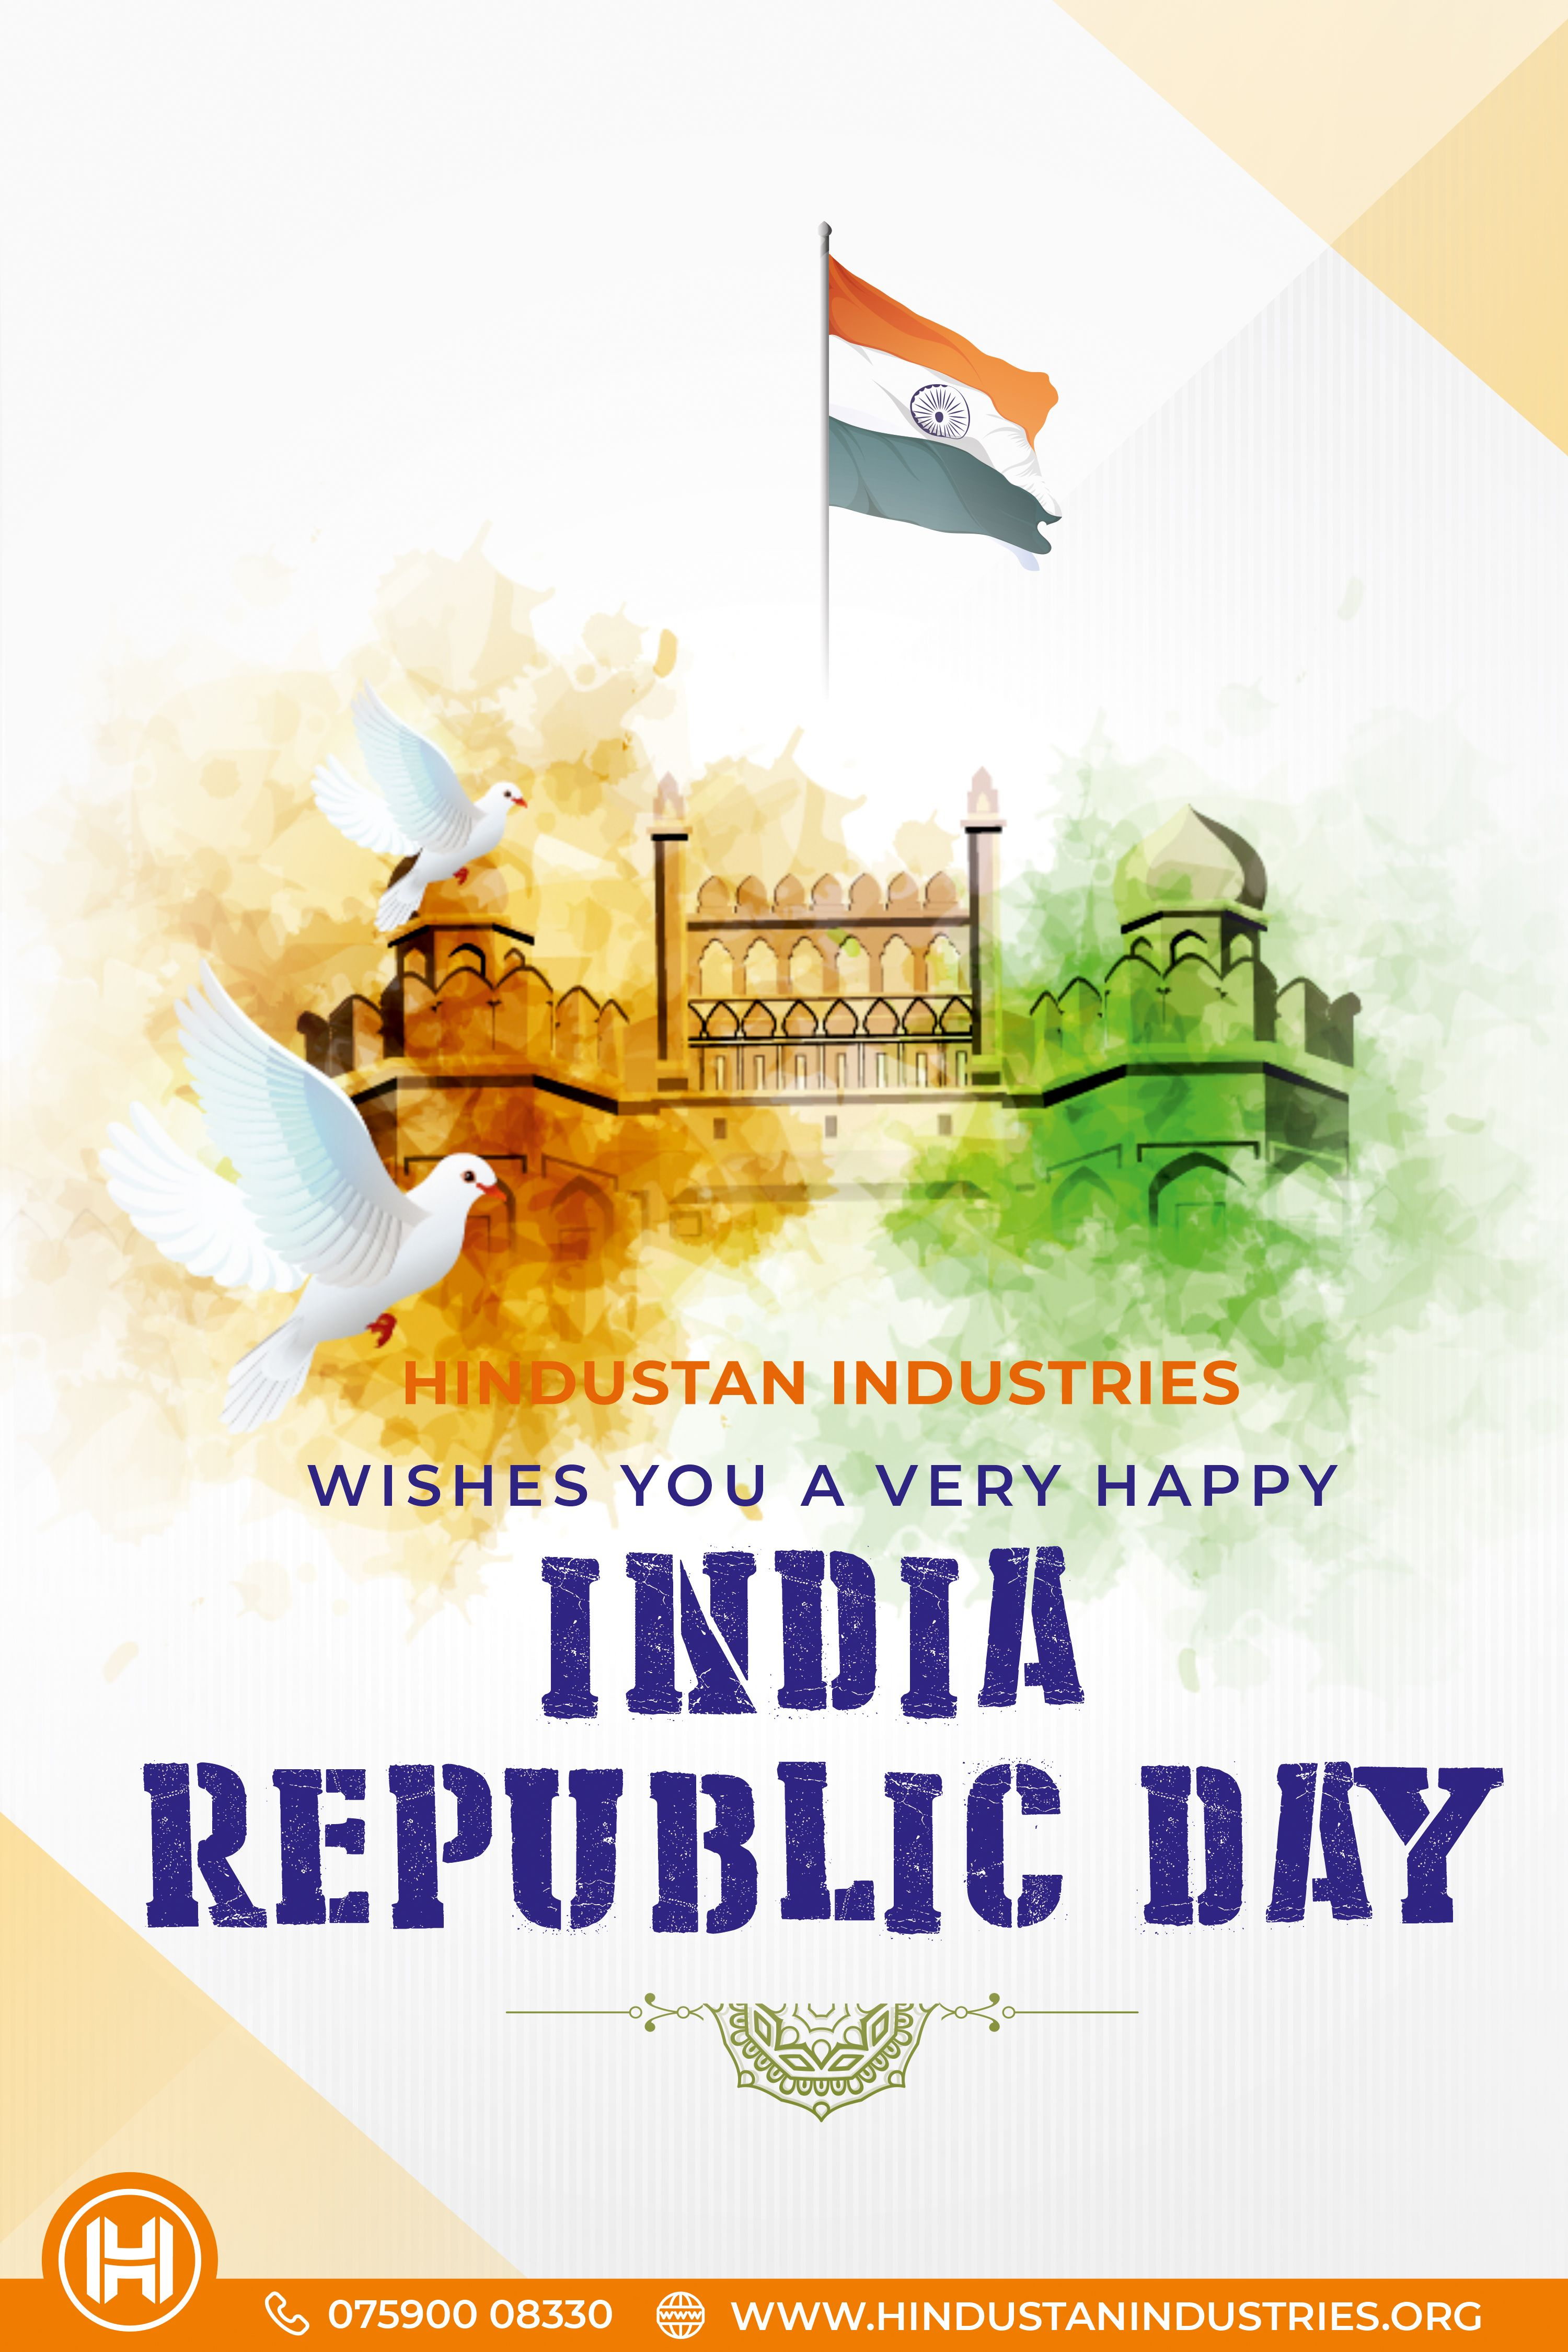 Happy Republic Day 2021 In 2021 Republic Day Day Wishes Republic Happy republic day india 2021 wishes